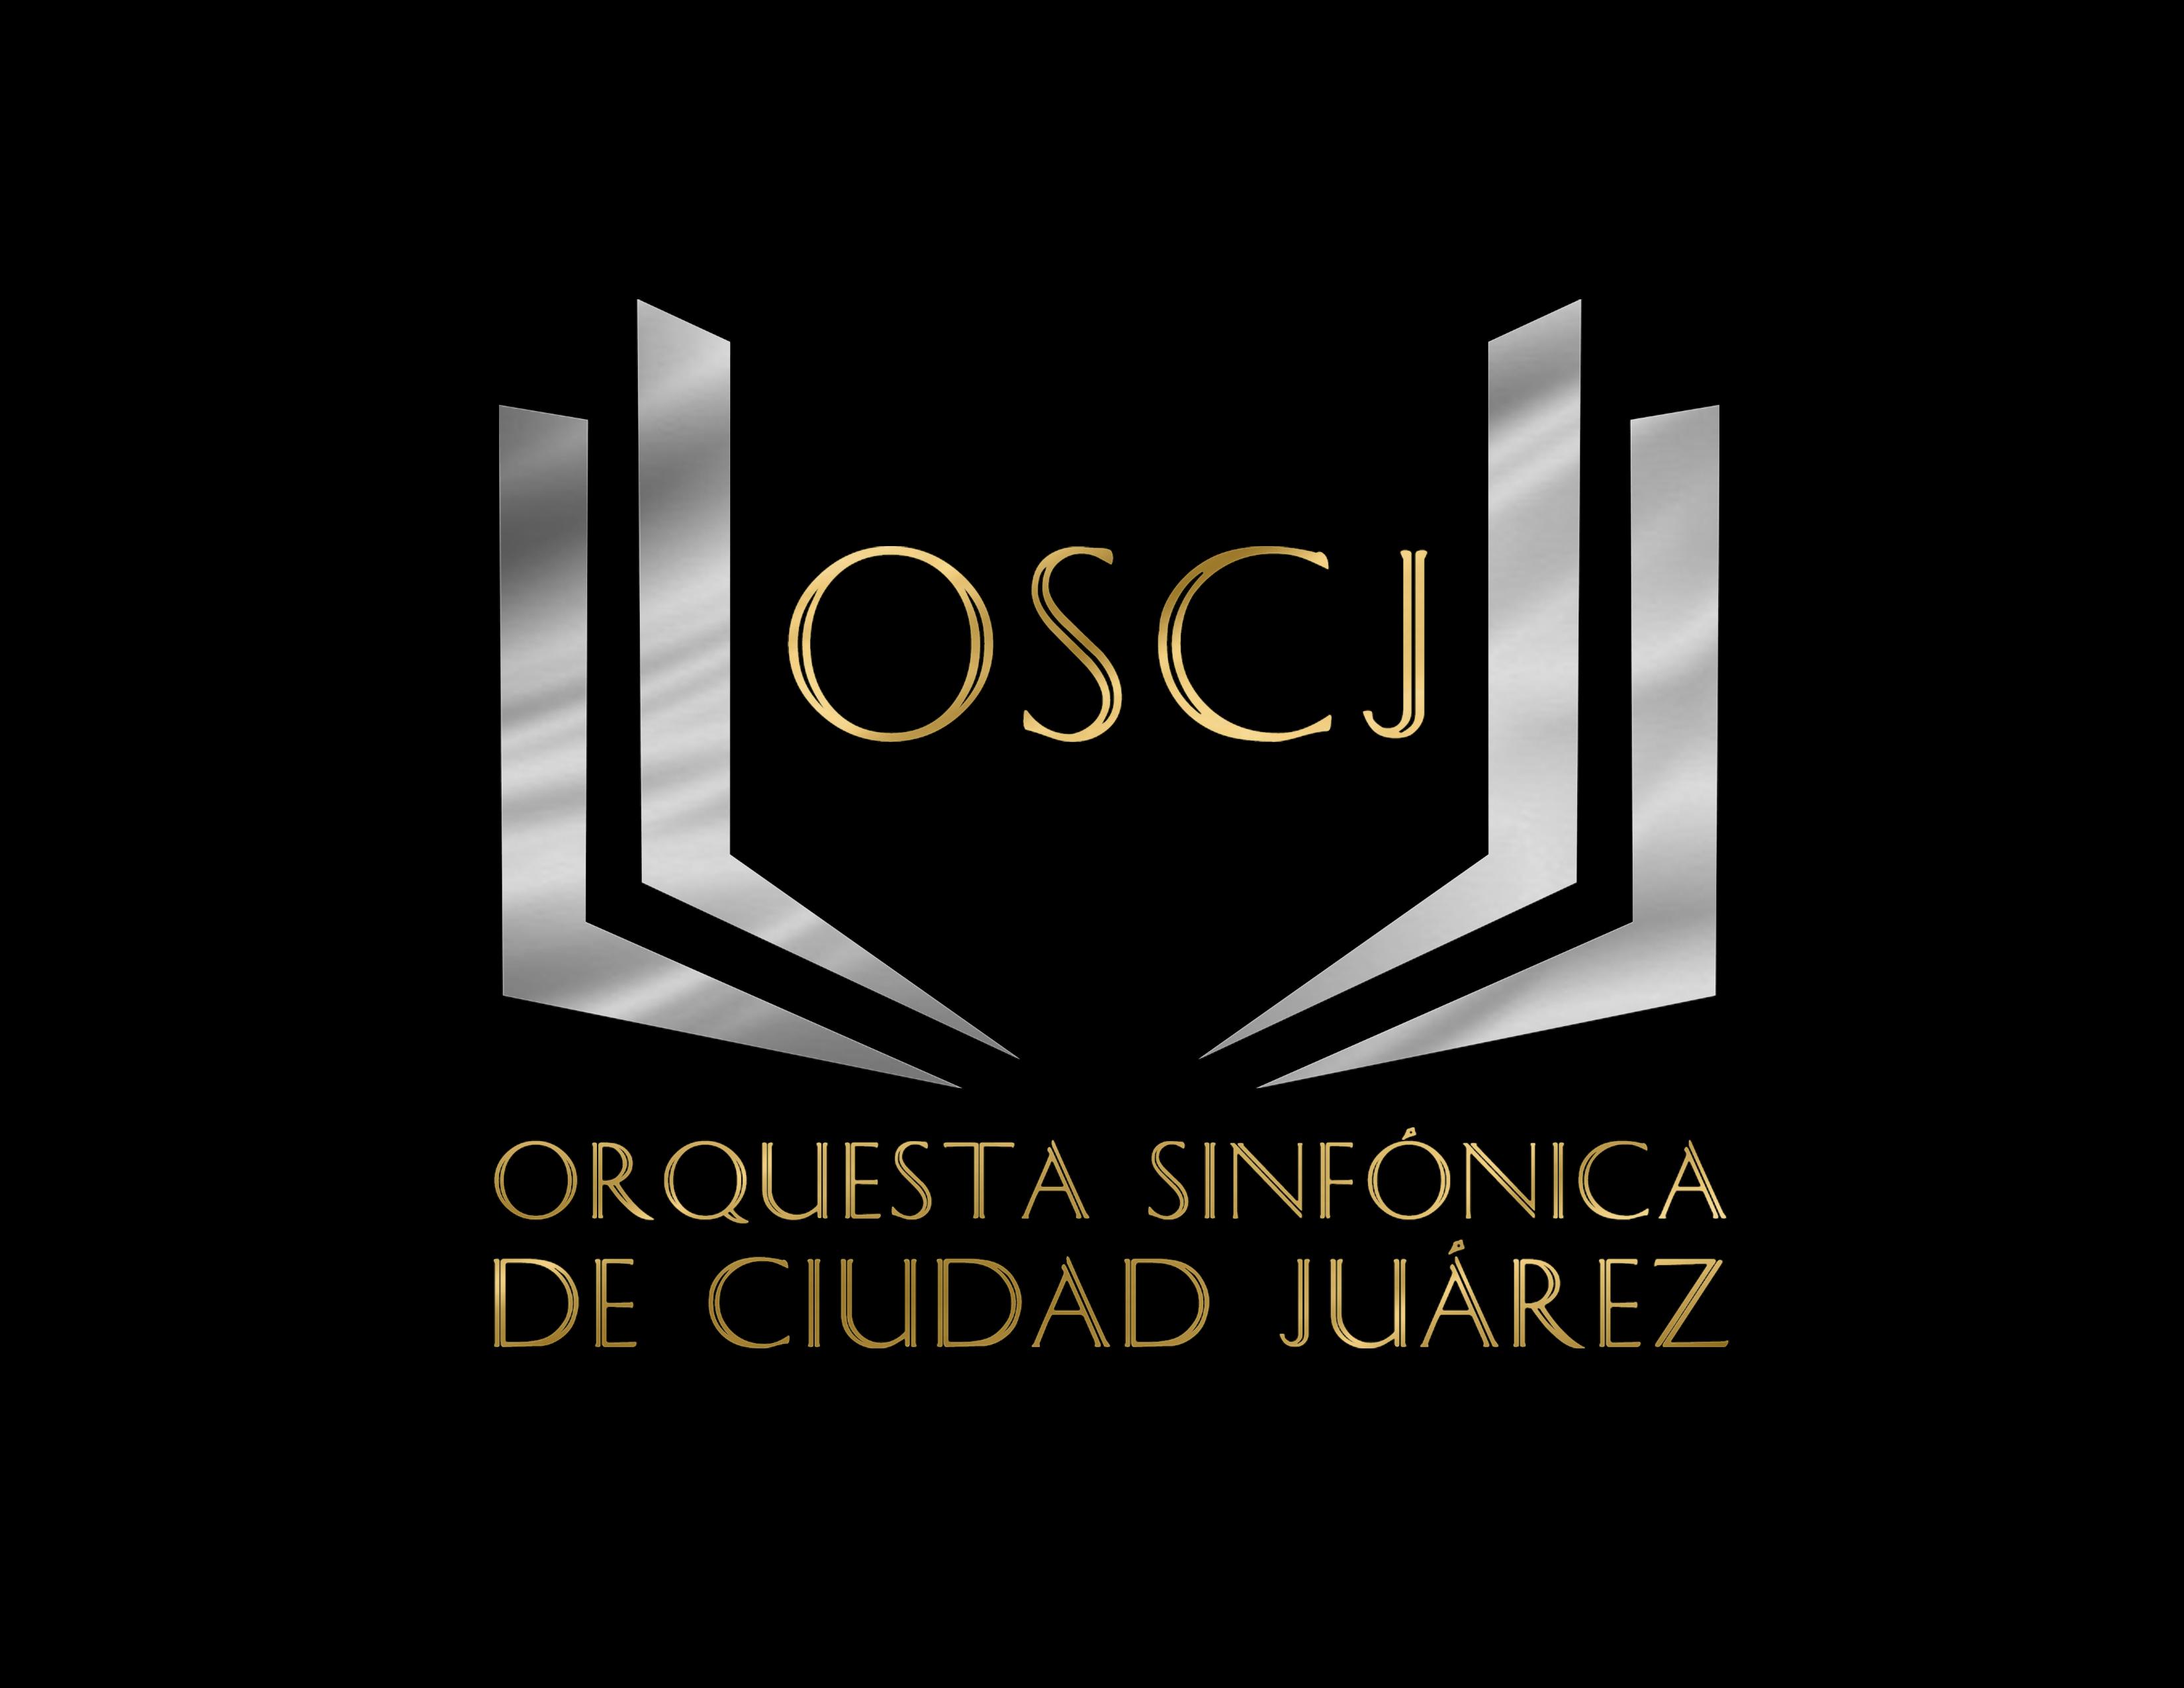 2. Logotipo OSCJ